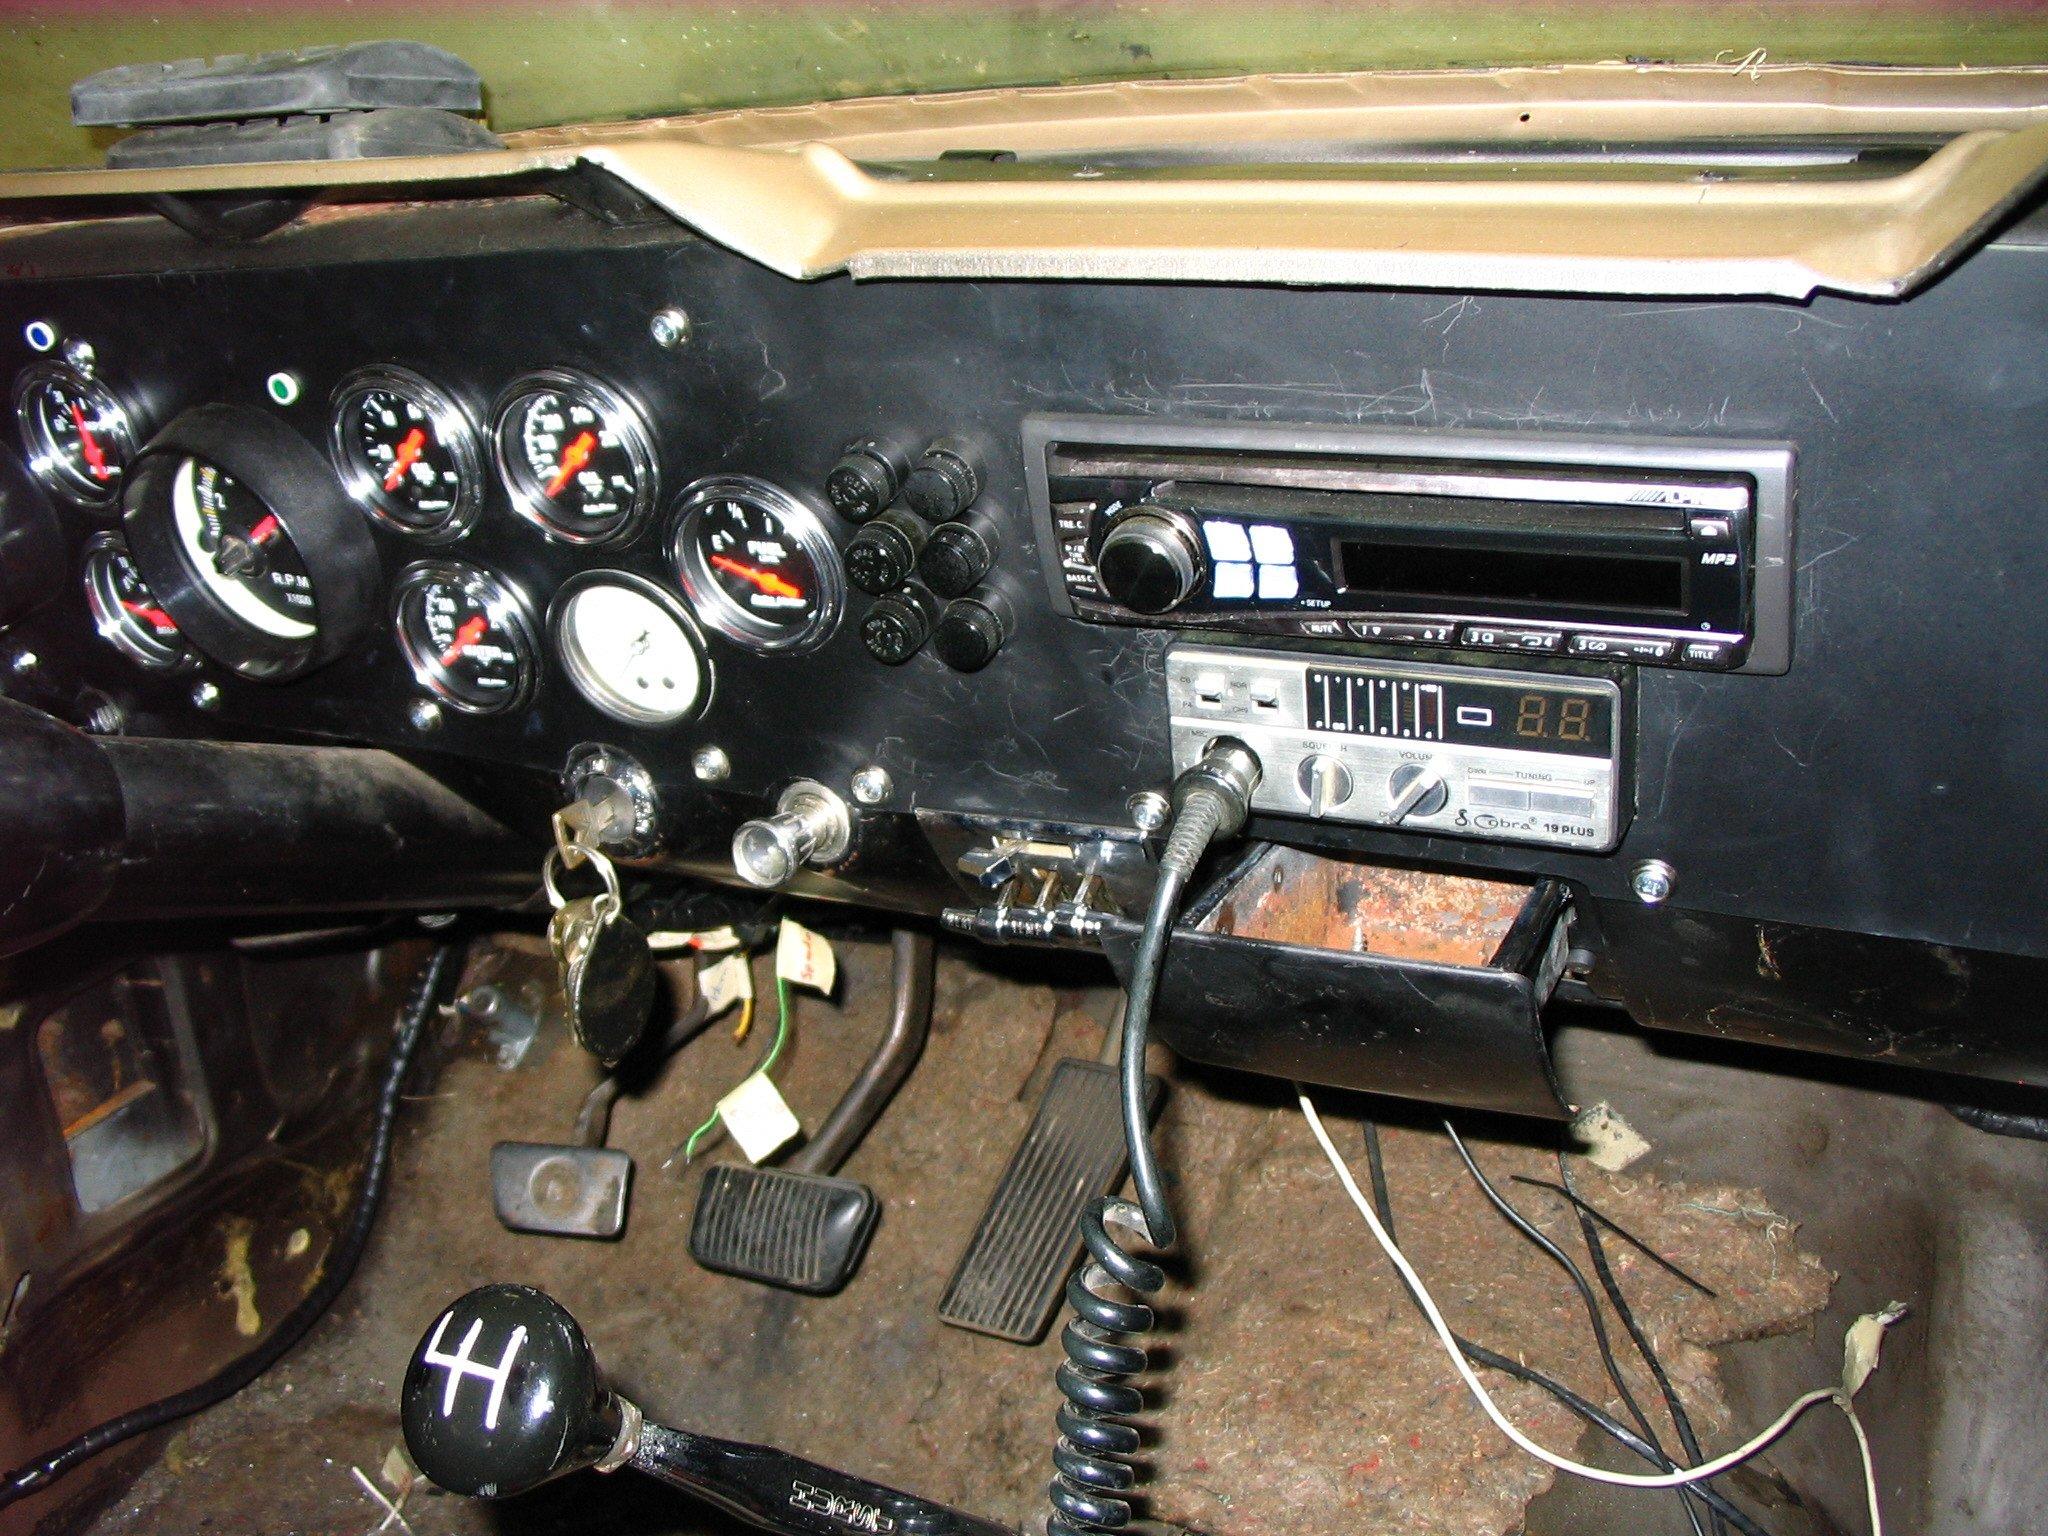 1966 Mustang Dash Panel Gauge Custom Ford Mustang Forum